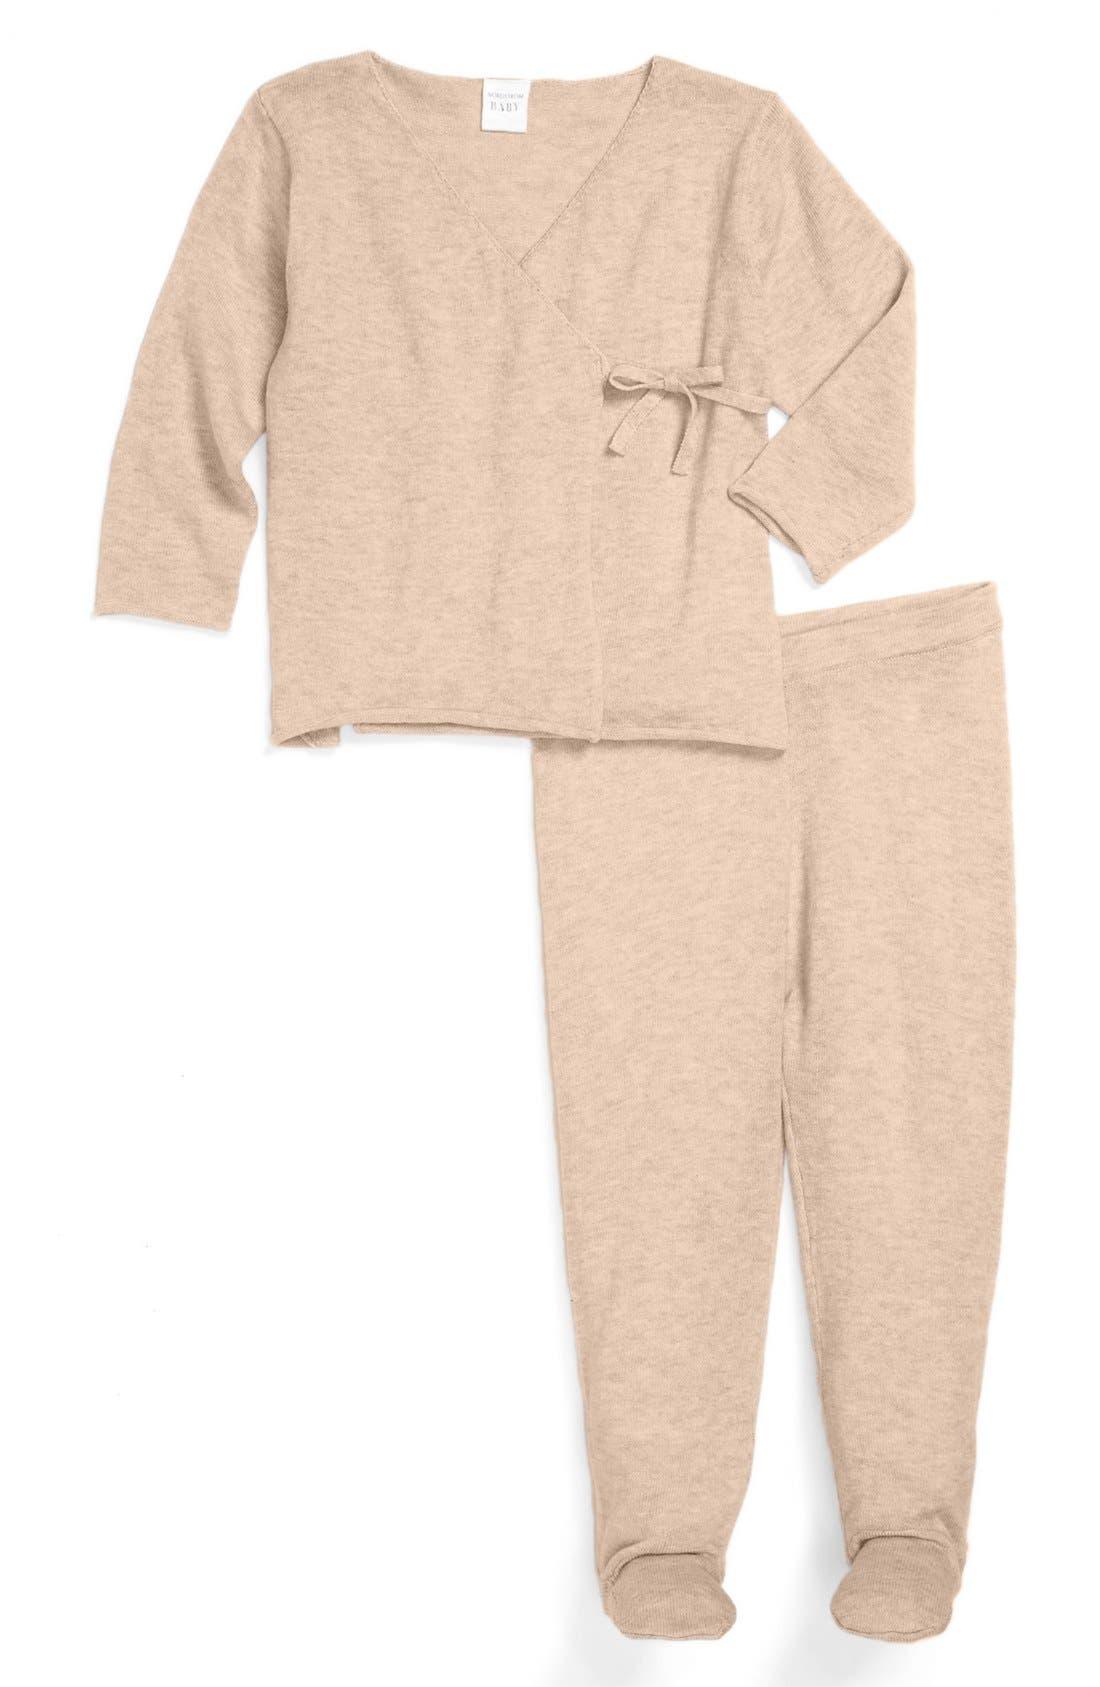 Main Image - Nordstrom Baby Top & Pants (Baby)